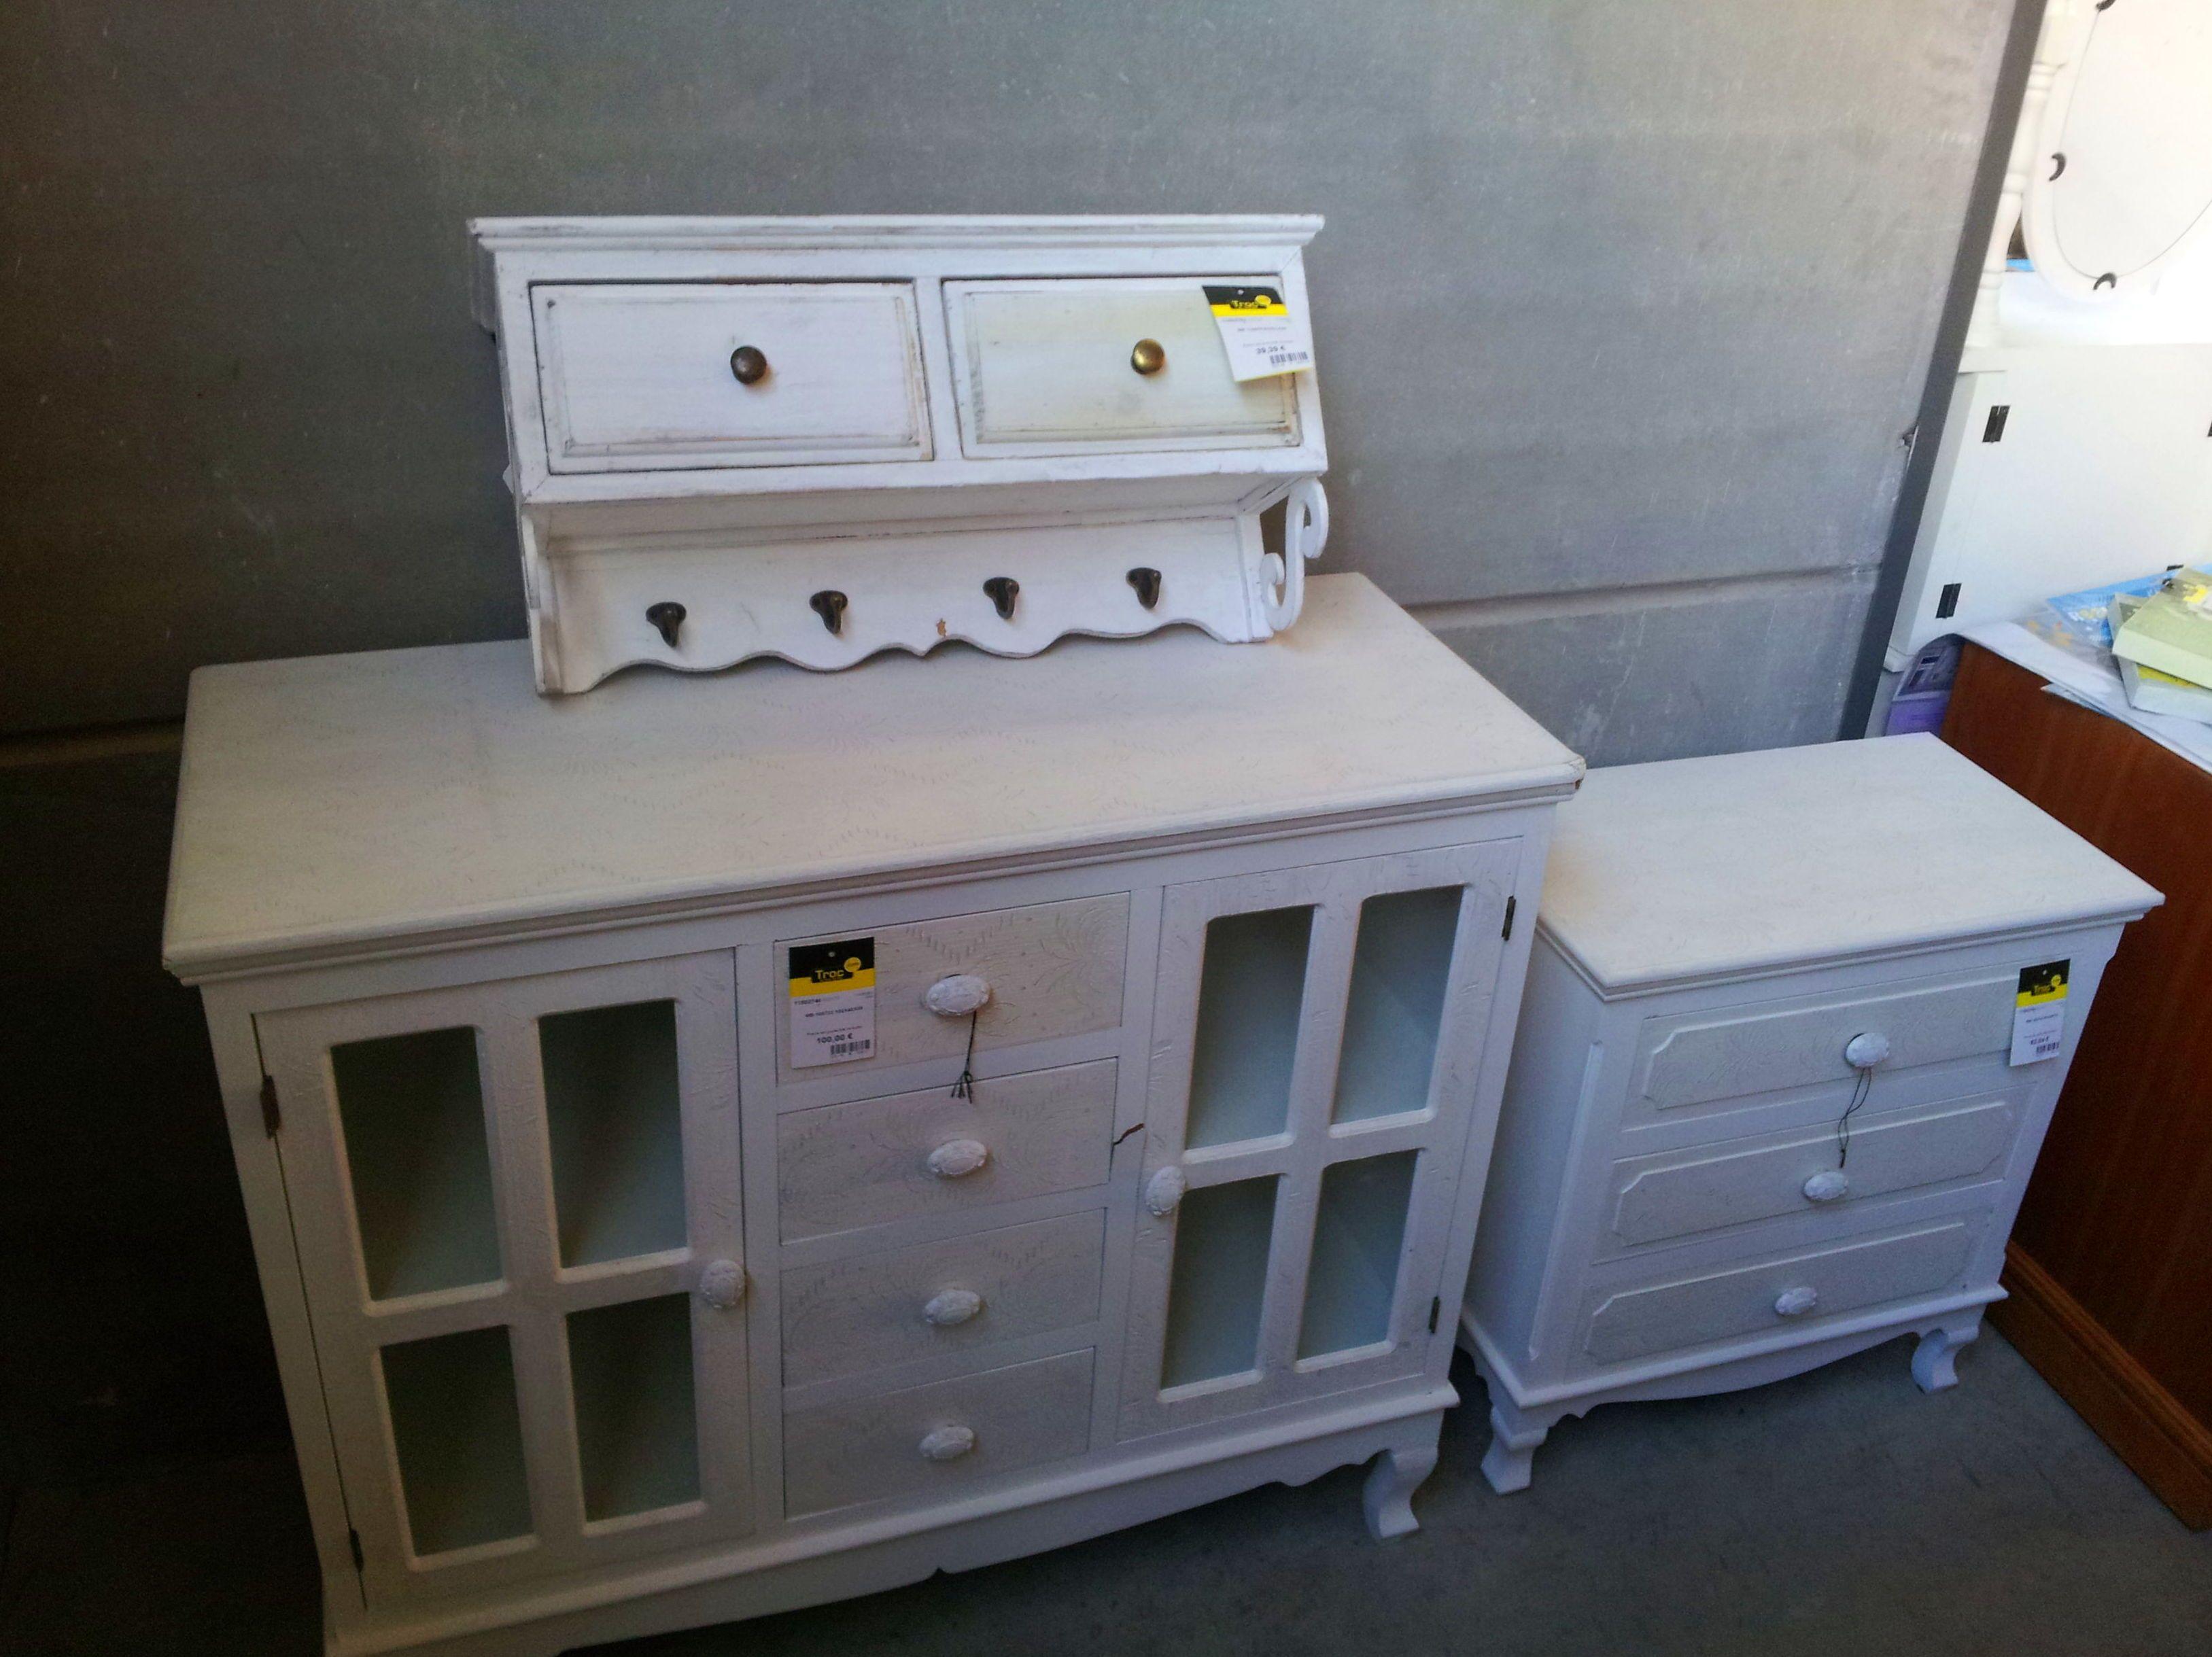 Muebles peluqueria segunda mano tenerife 20170713192438 - Compra venta muebles usados madrid ...